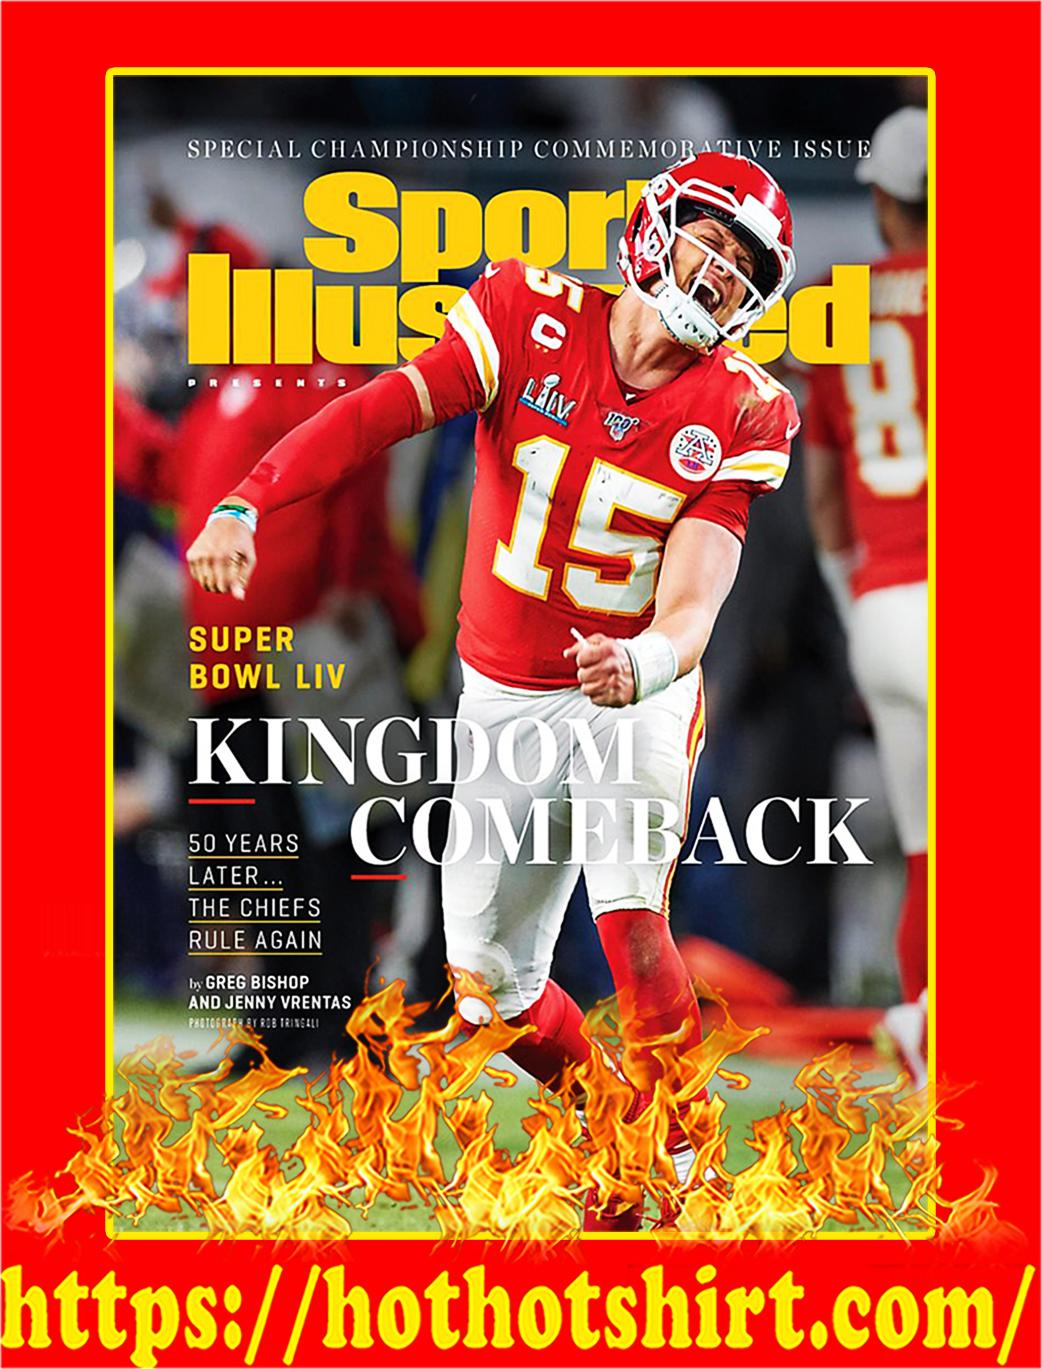 Super Bowl LIV Kingdom Comback Chiefs Poster - A1